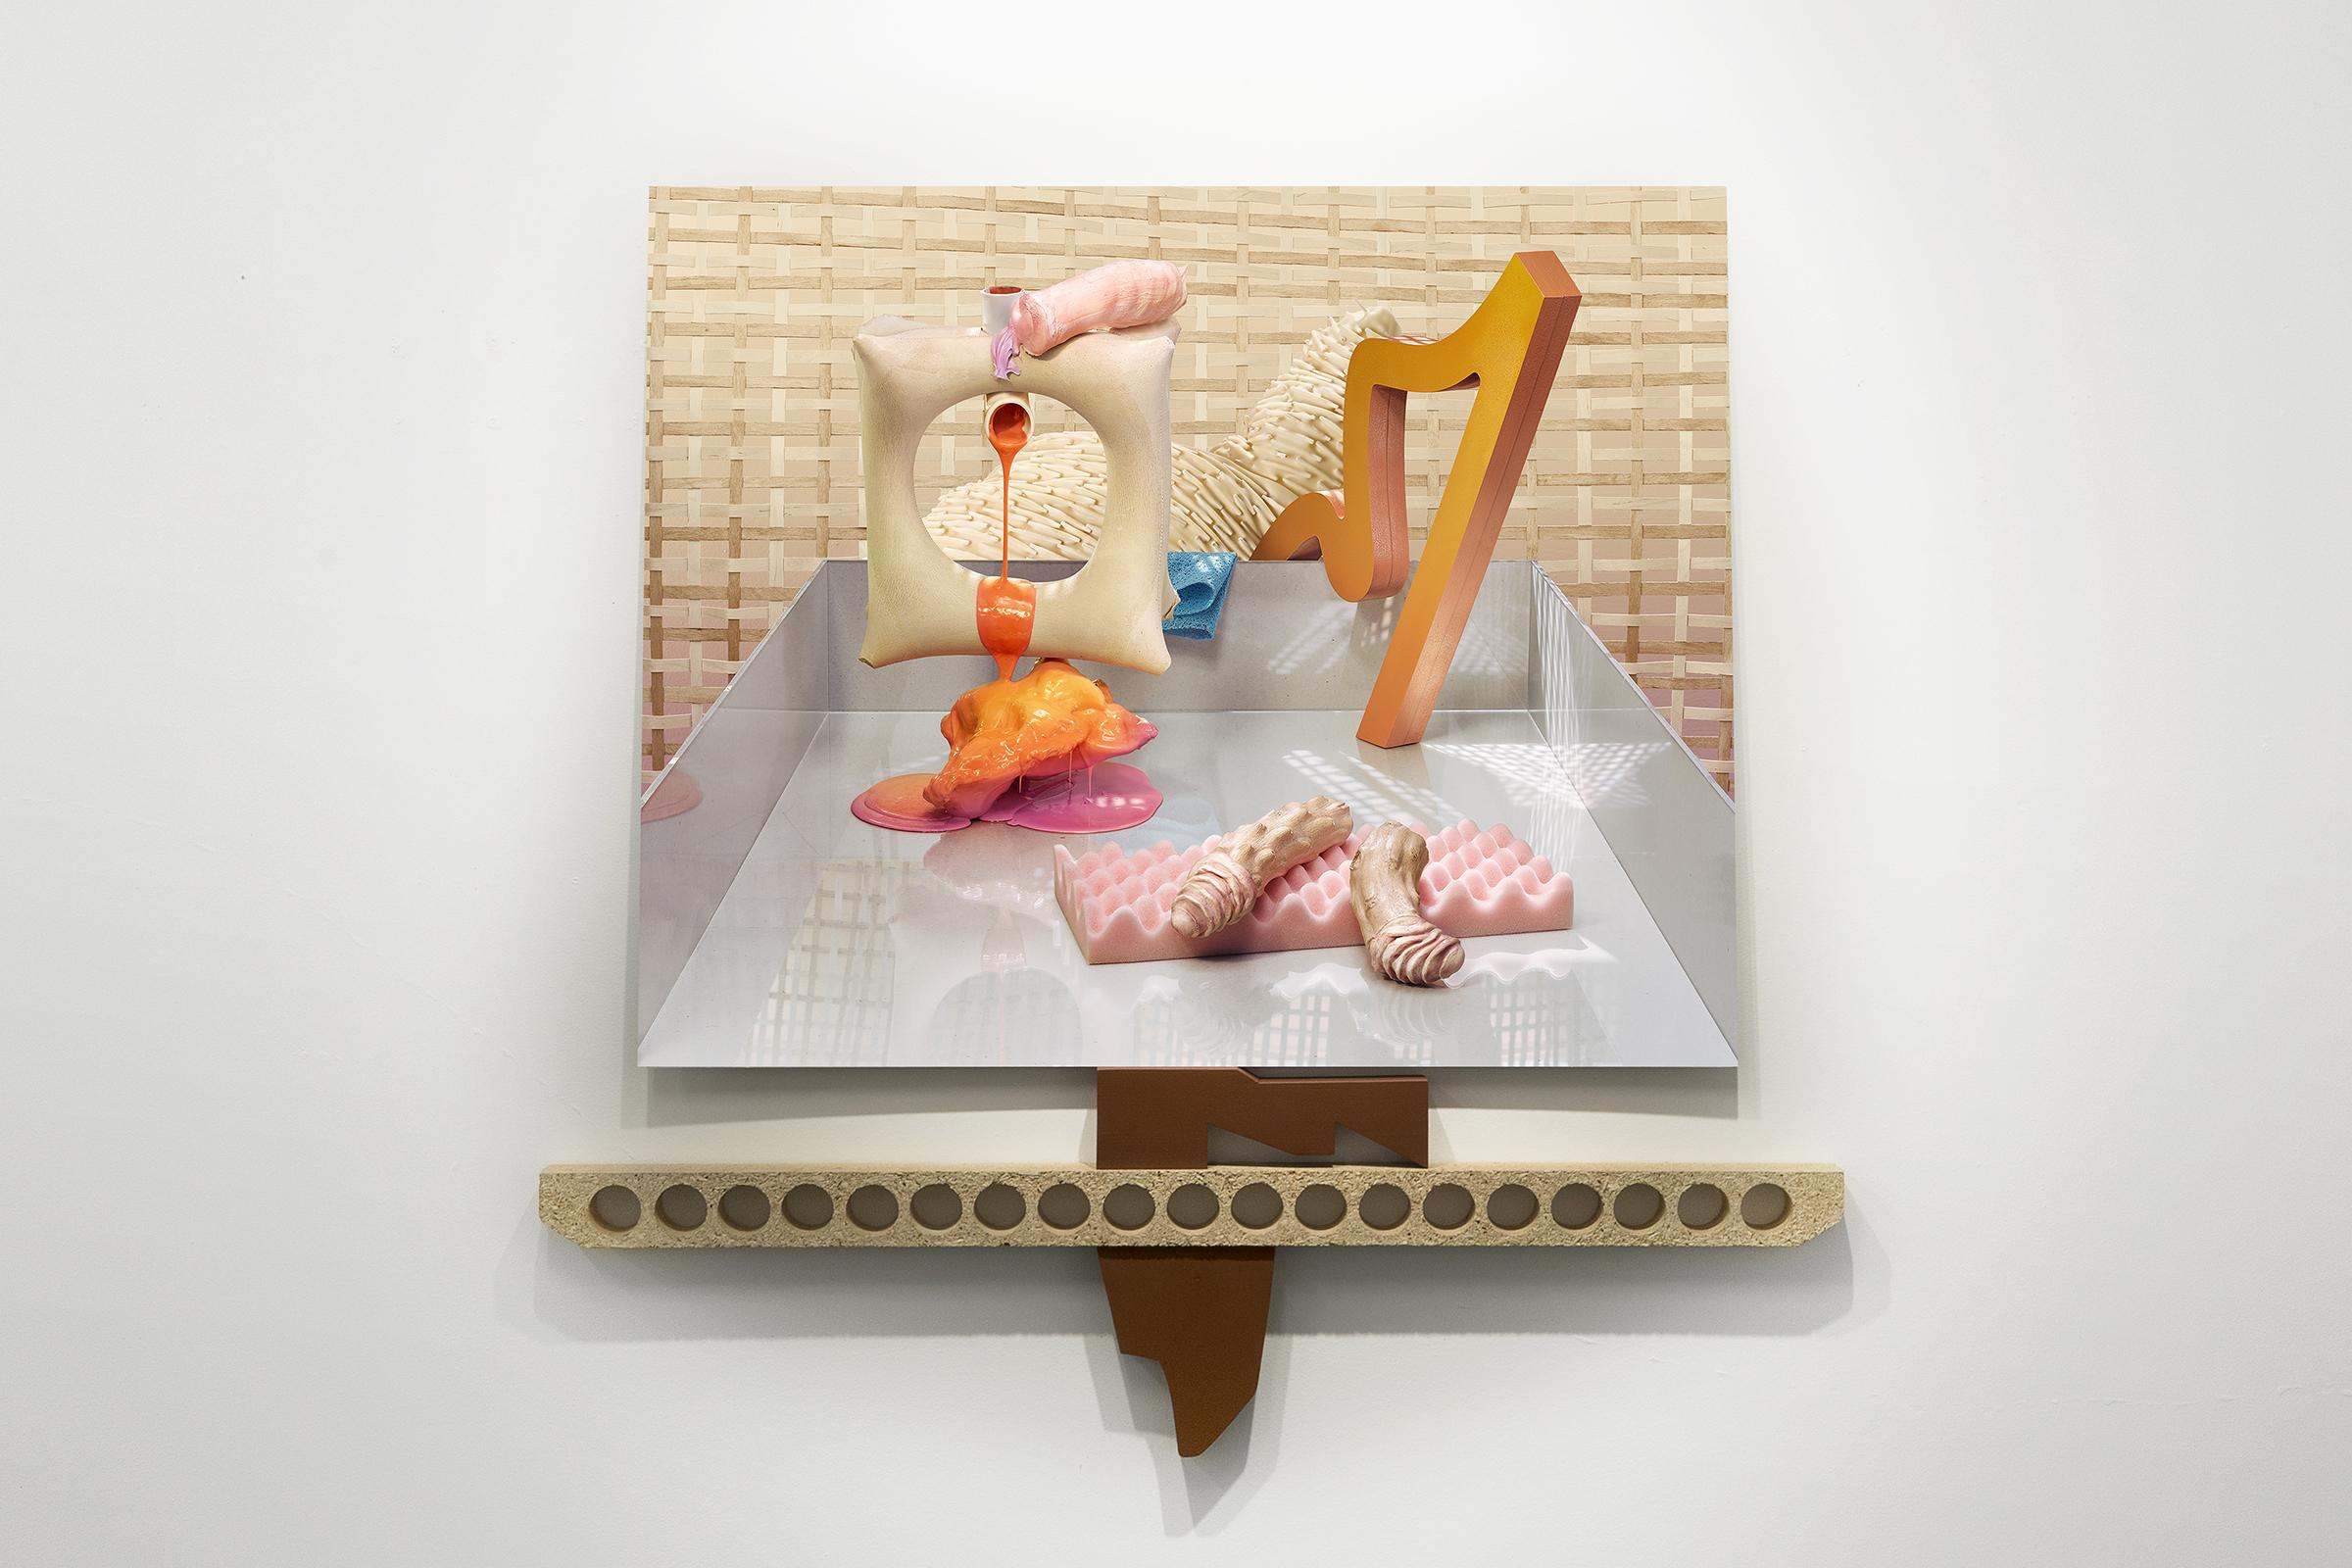 Postmodern Affair, C-type print on aluminium and wood 2014